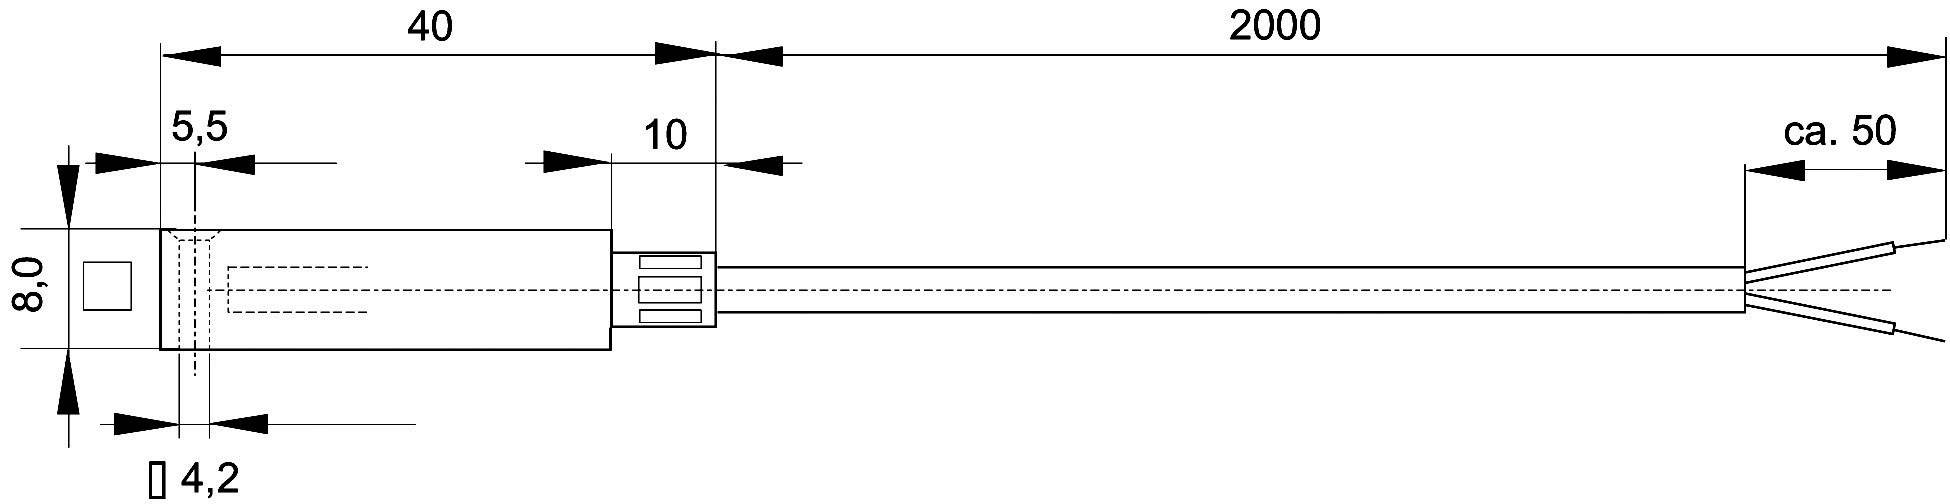 Termočlánek Enda K10-TC-J, -50 až 400 °C, délka kabelu 2 m